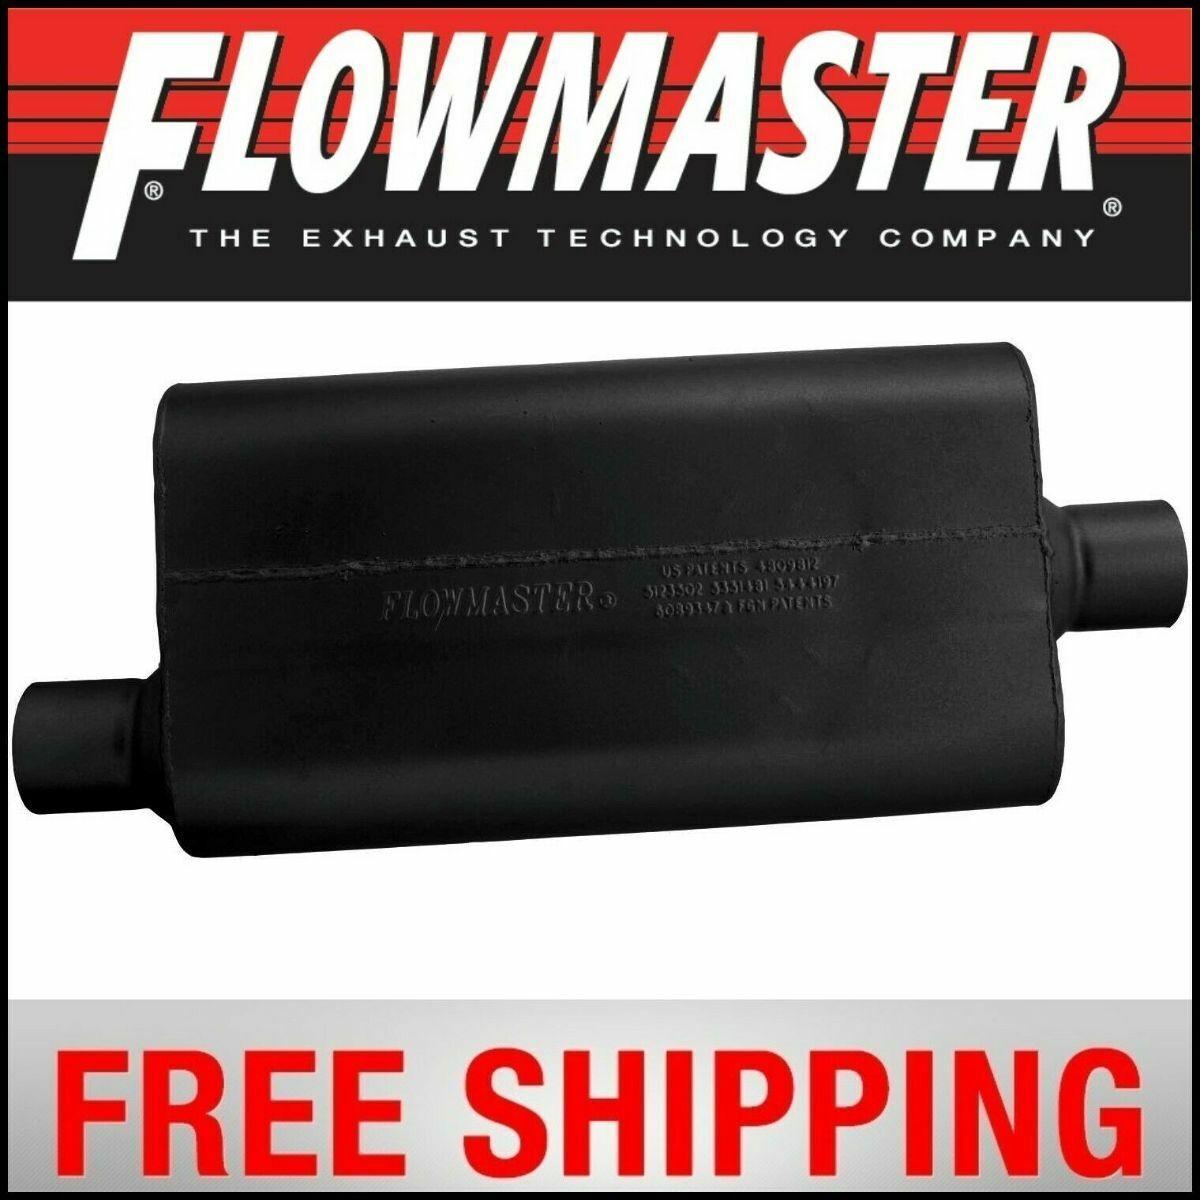 2.50 Center OUT 2.50 Offset IN Flowmaster 942551 50 Delta Flow Muffler Moderate Sound